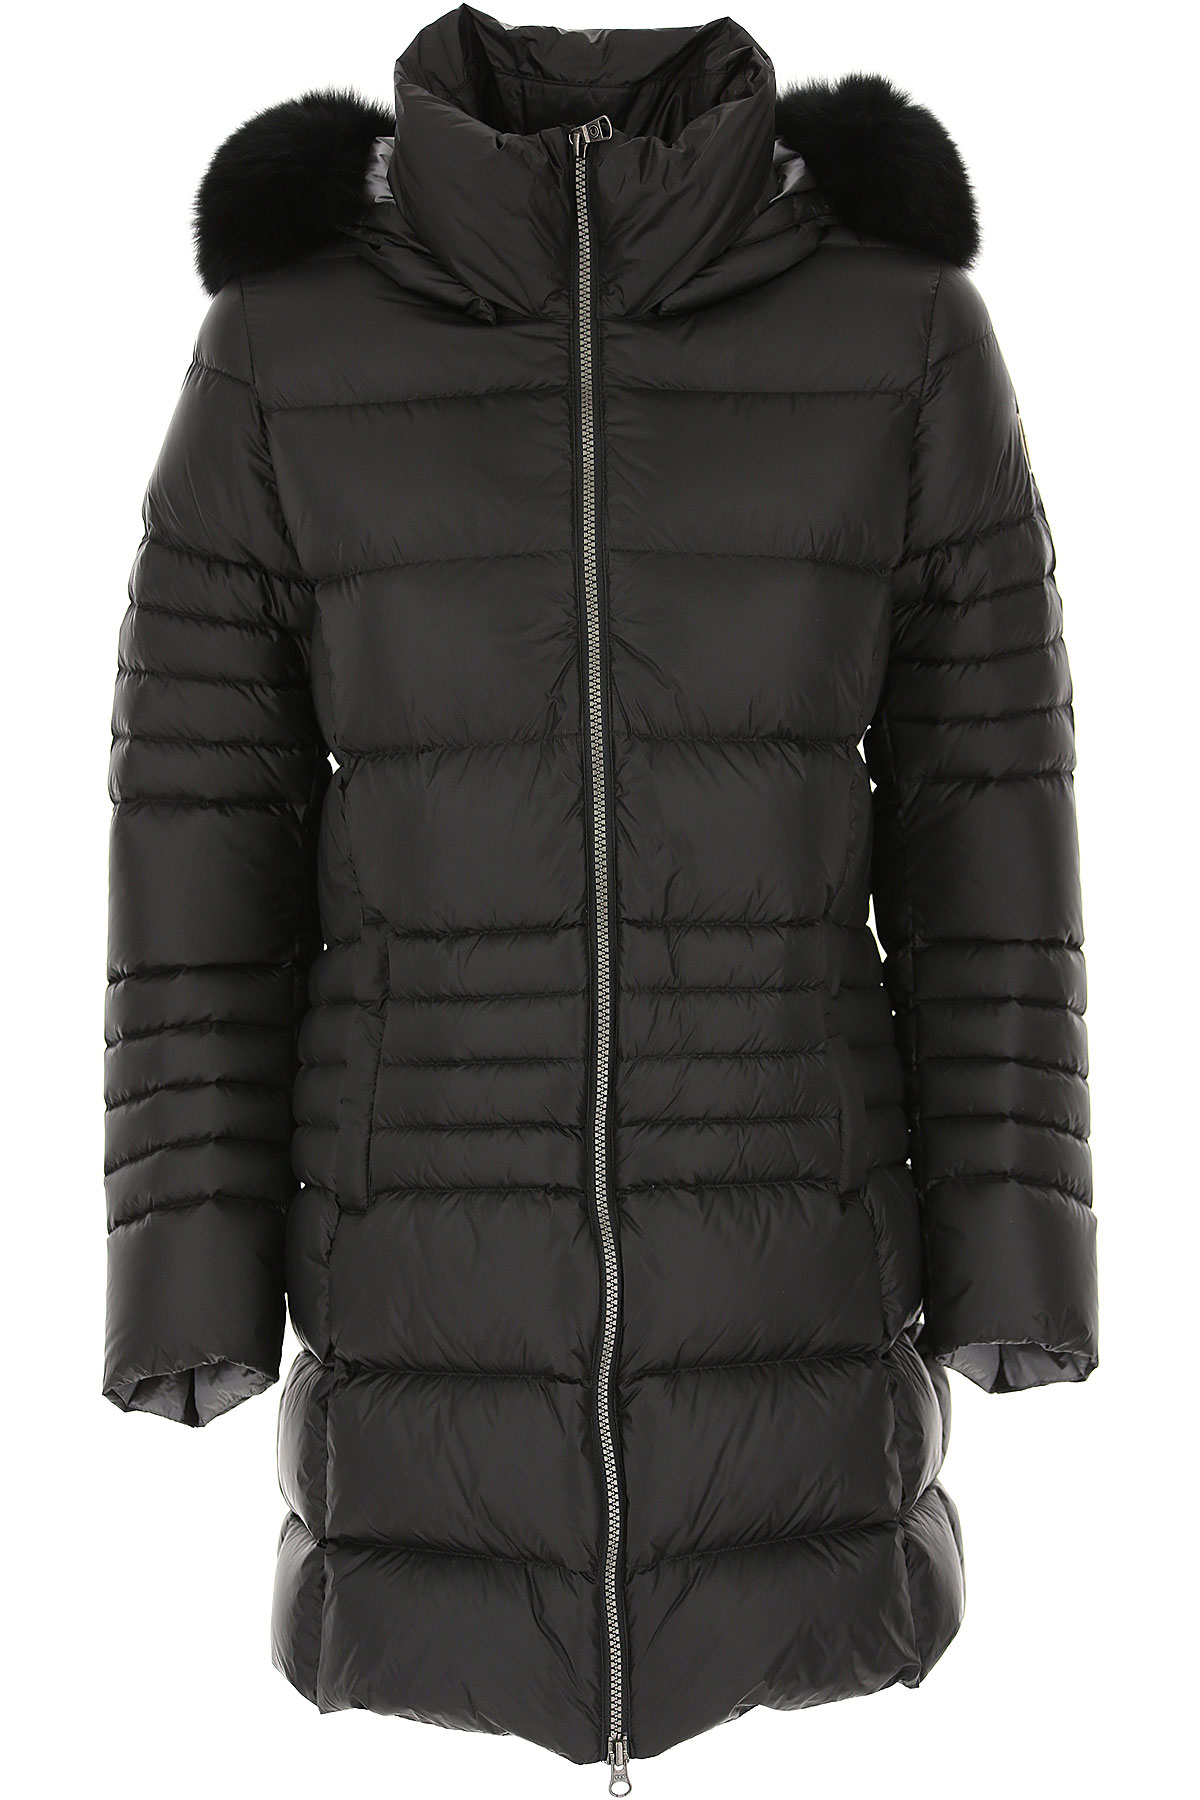 Colmar Down Jacket for Women, Puffer Ski Jacket On Sale, Black, polyamide, 2019, 10 12 2 4 6 8